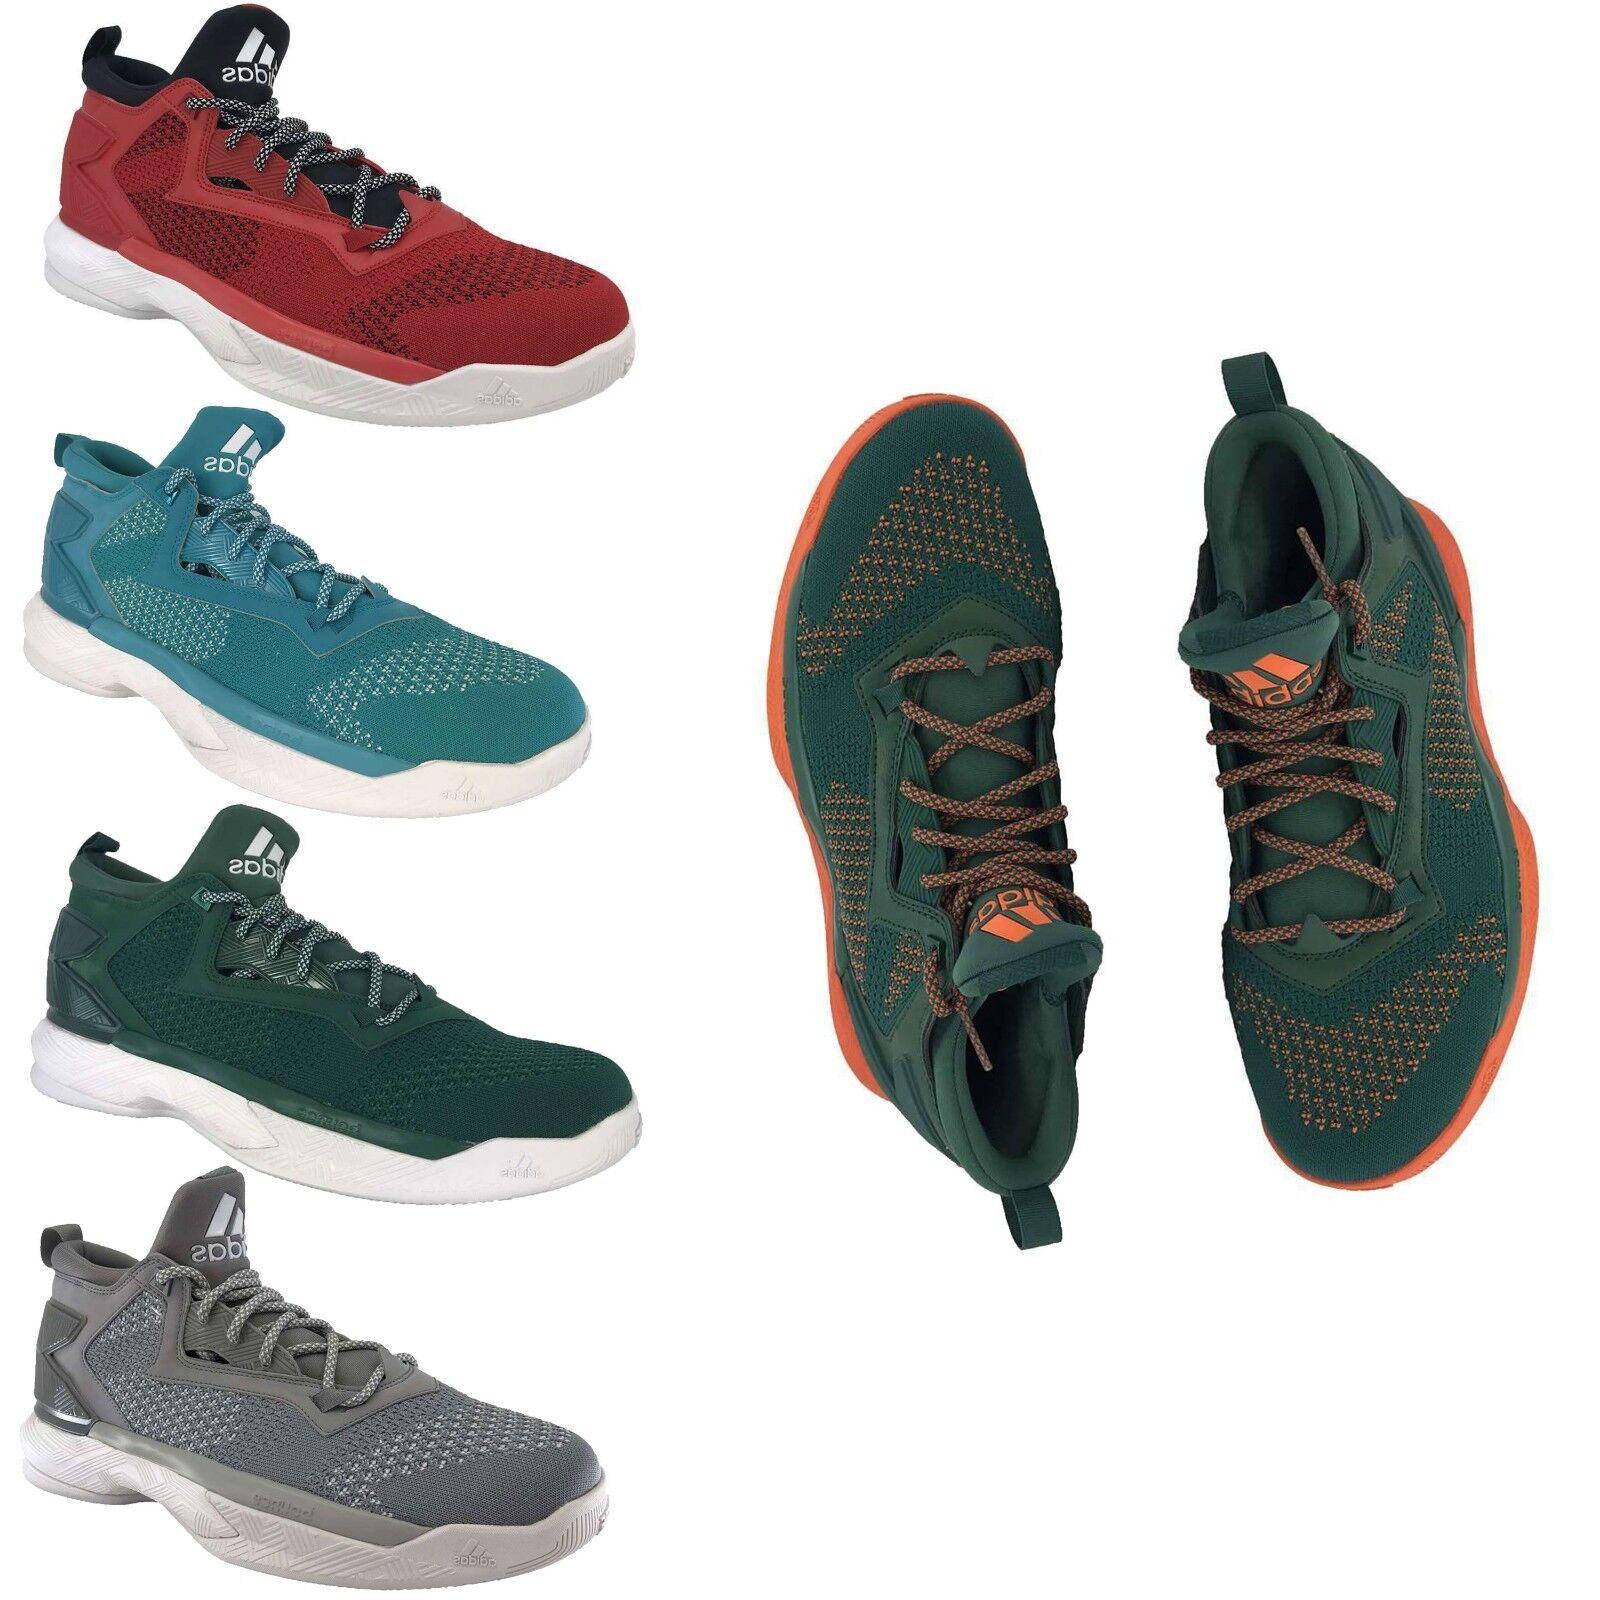 Adidas Uomo Damien Lillard 2 Veterans Day PK PK PK Basketball scarpe NBA scarpe da ginnastica NEW 8479b7